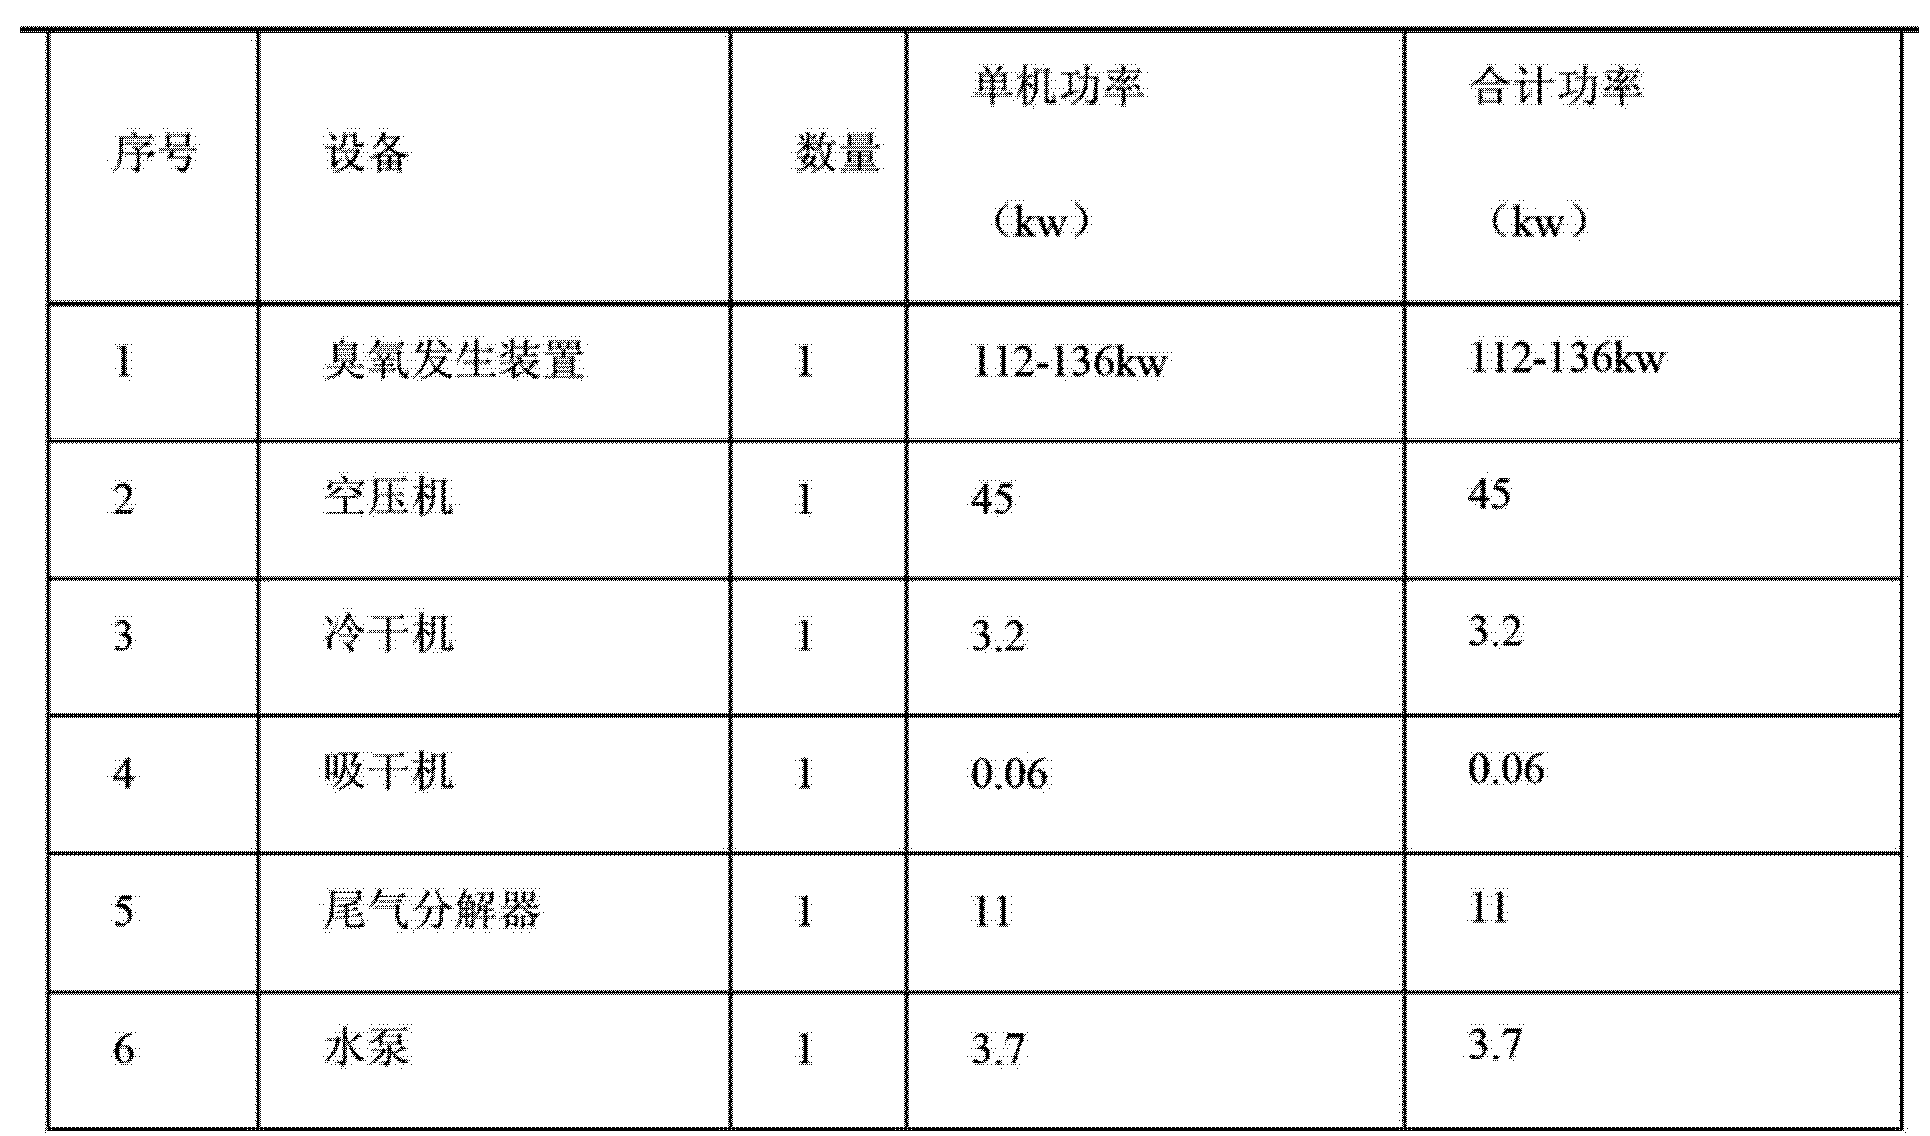 Cn203461871u Advanced Ozone Oxidation Device Google Patents Generator Circuit Water For Pool Figure Cn203461871ud00061